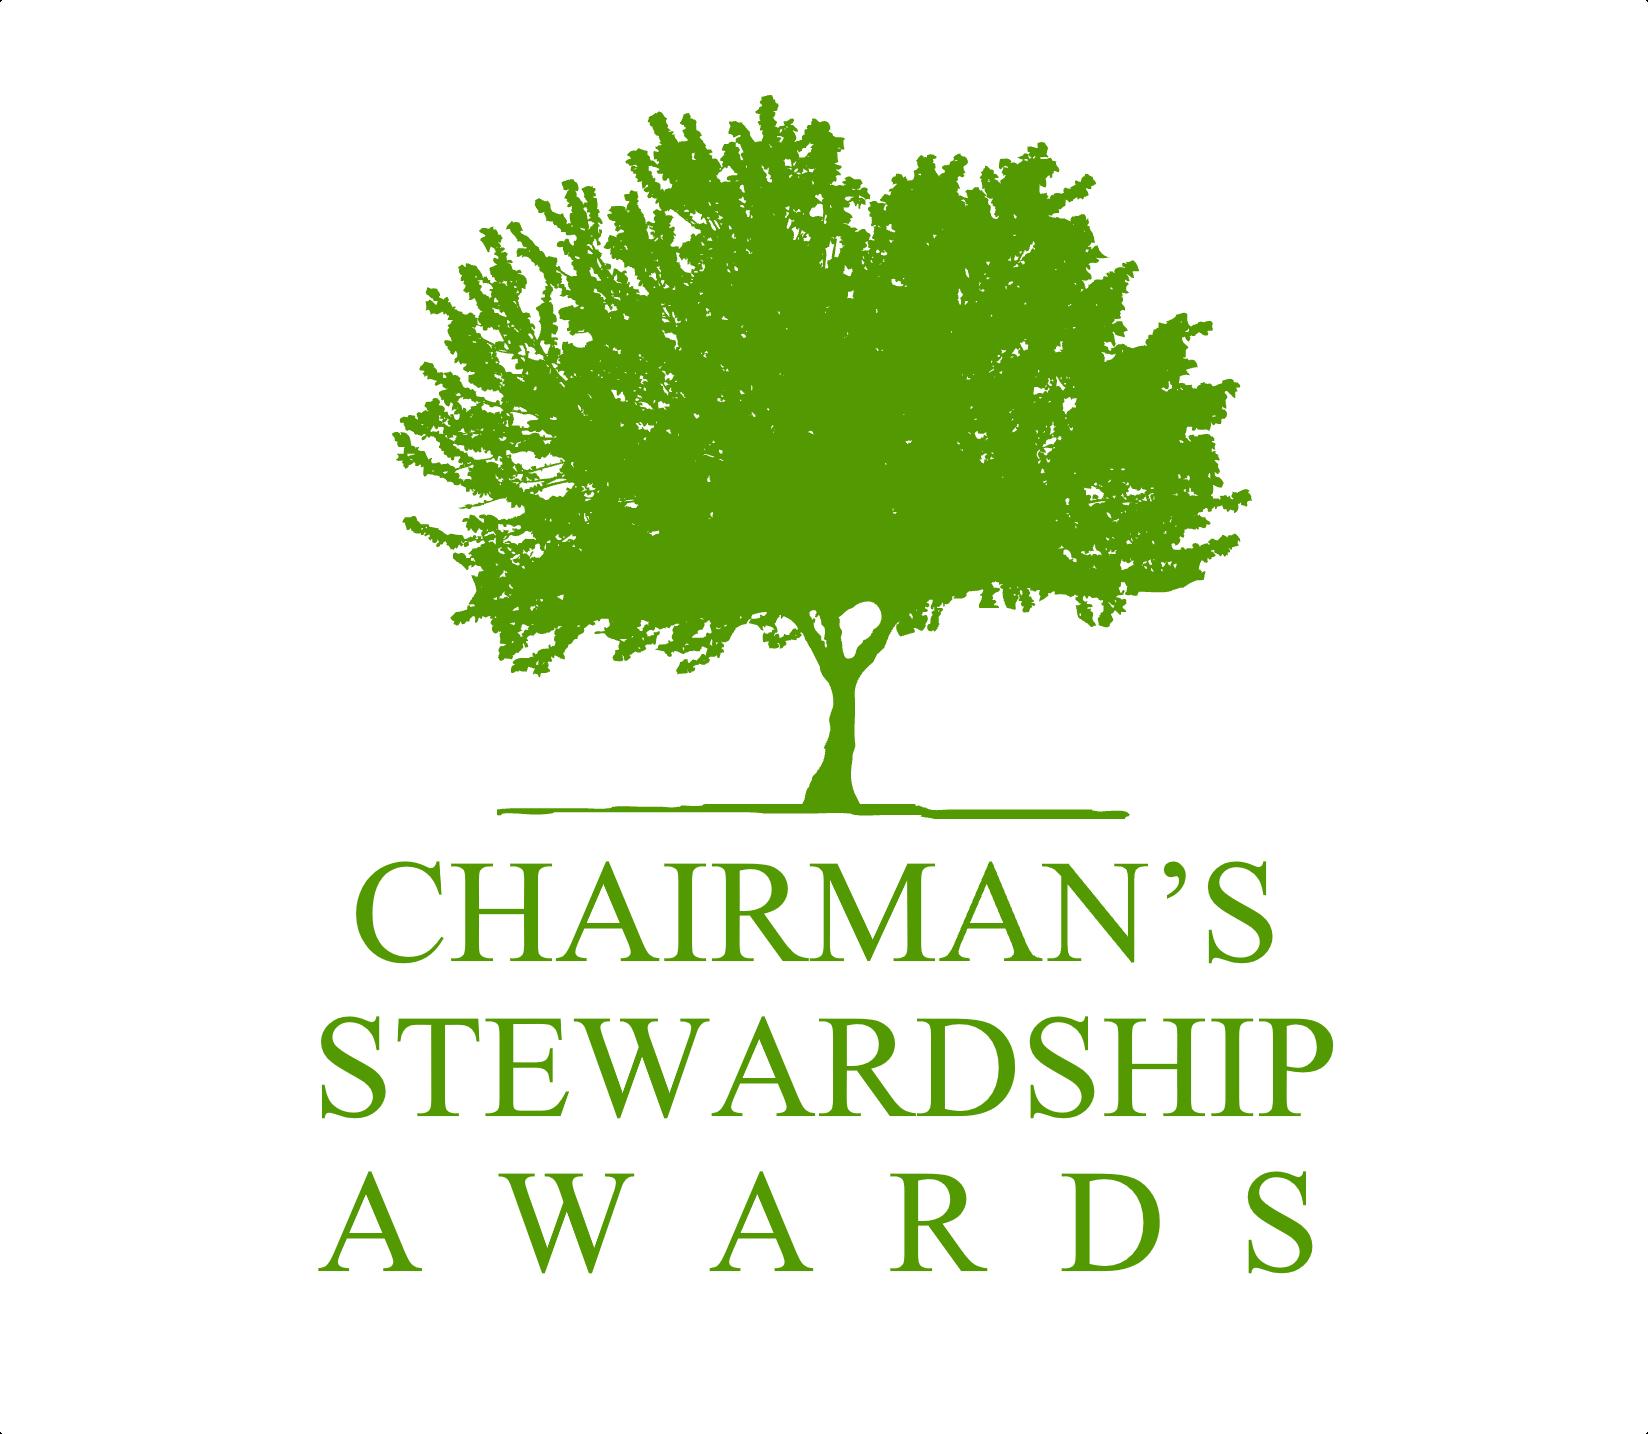 a green tree logo of the Chairman's Stewardship Awards